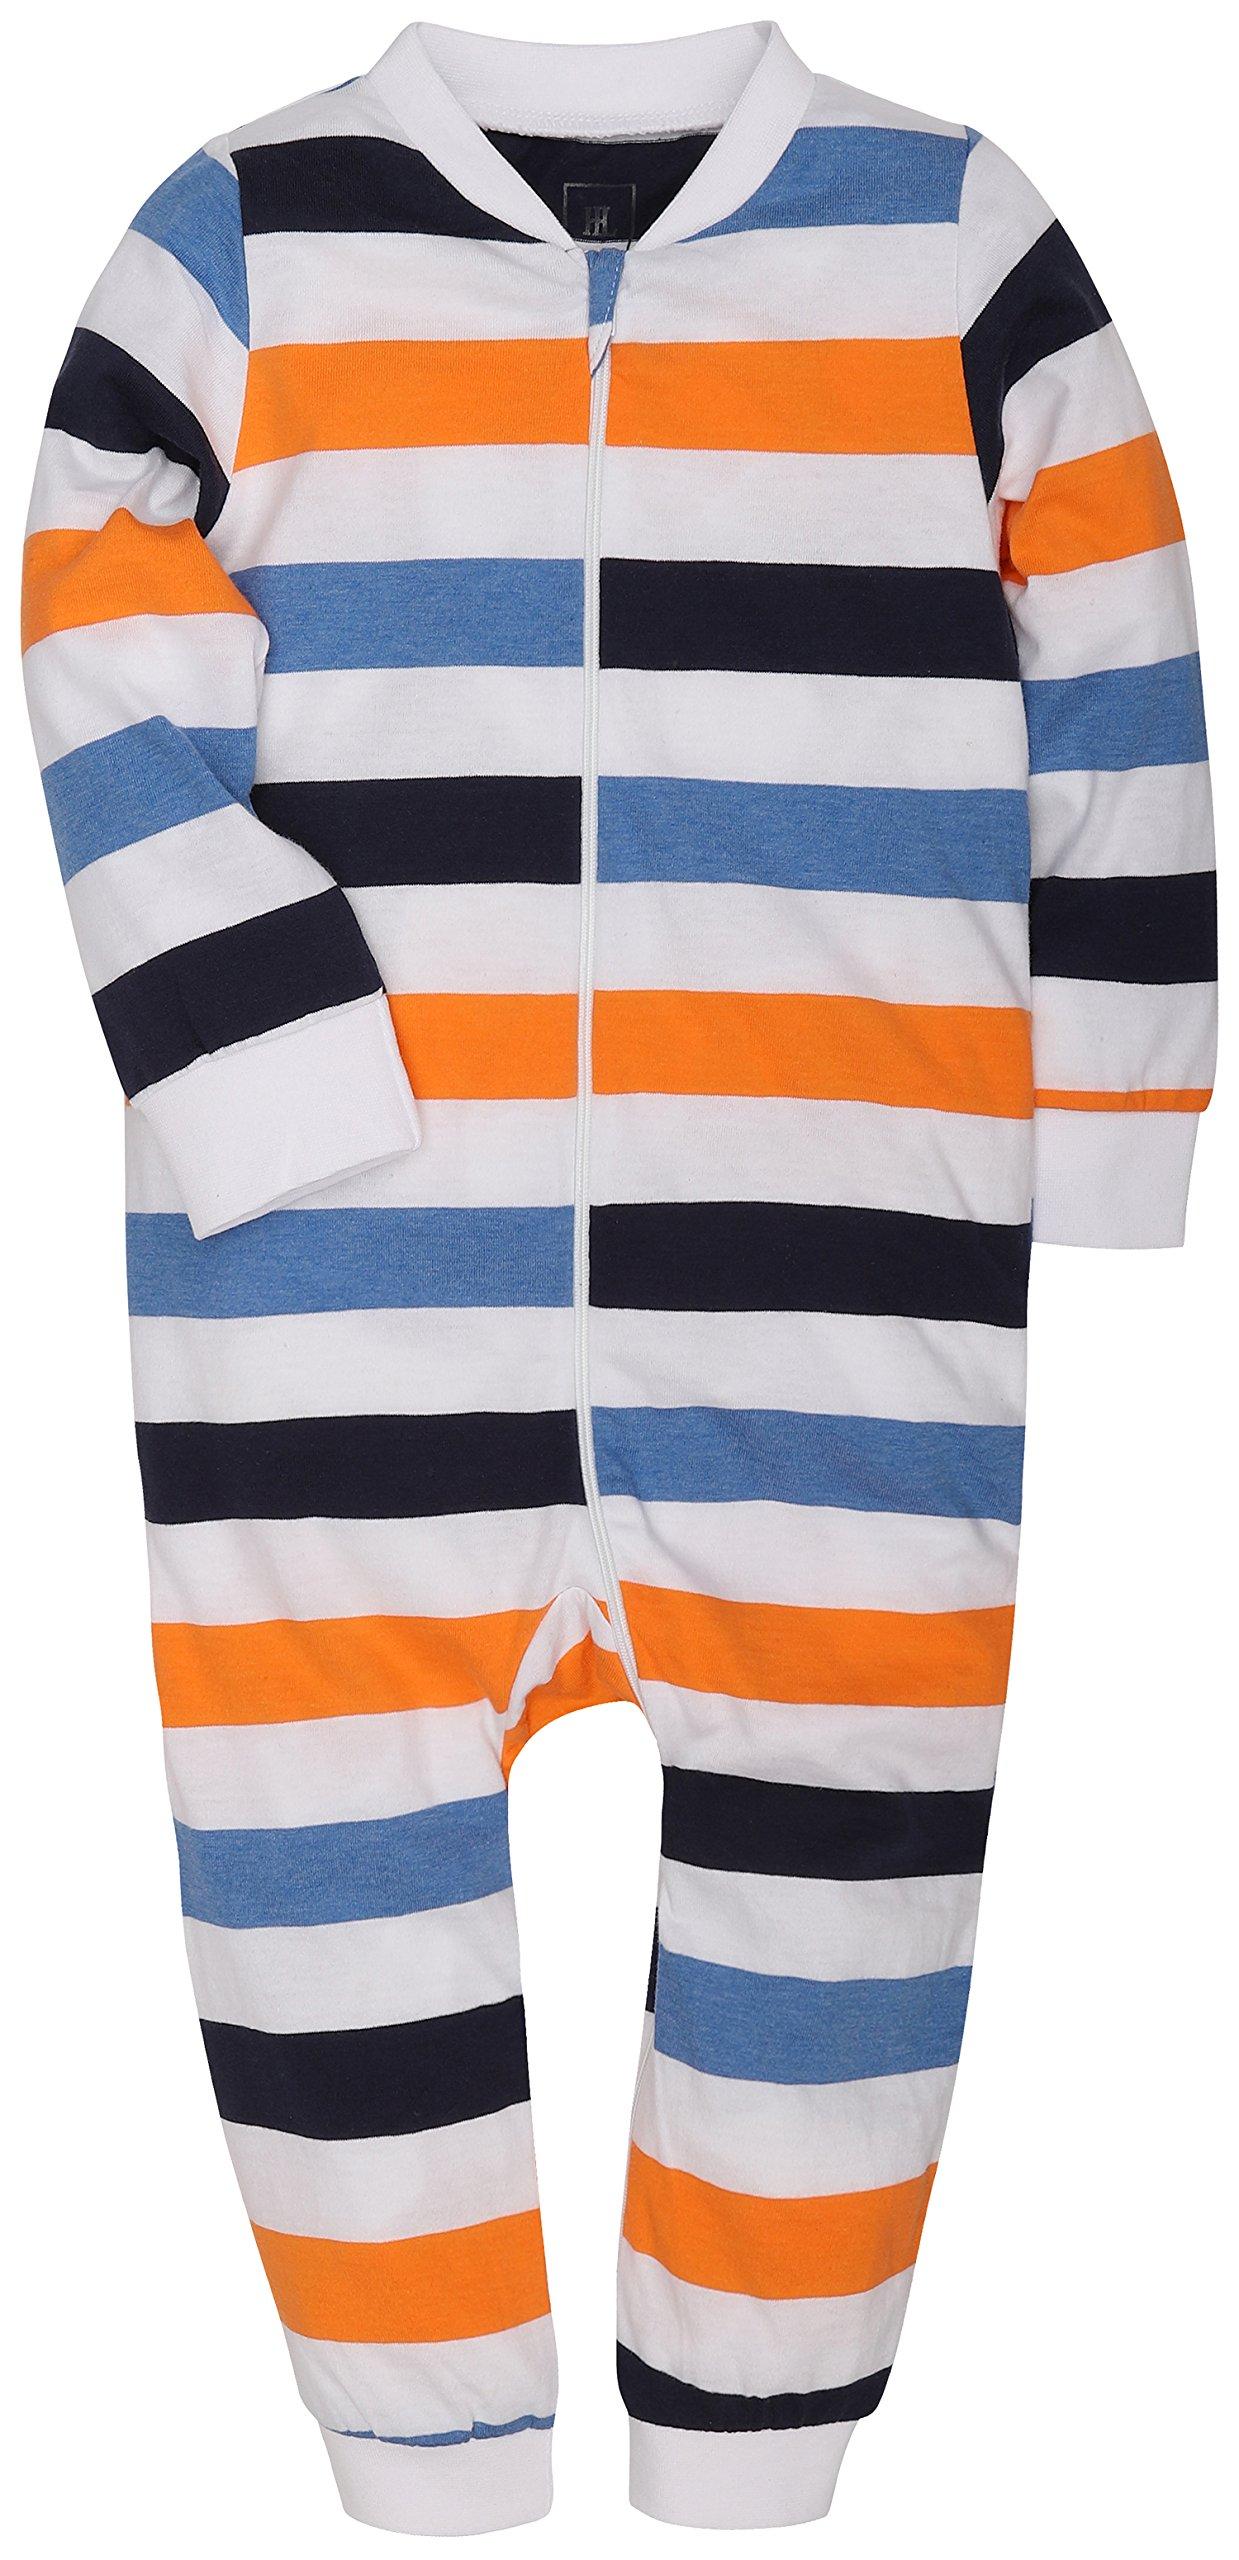 MZL 2-Pack Baby Infant Boy Girl Pajamas Romper Clothes Bodysuit Newborn Jumpsuit by MZL (Image #3)